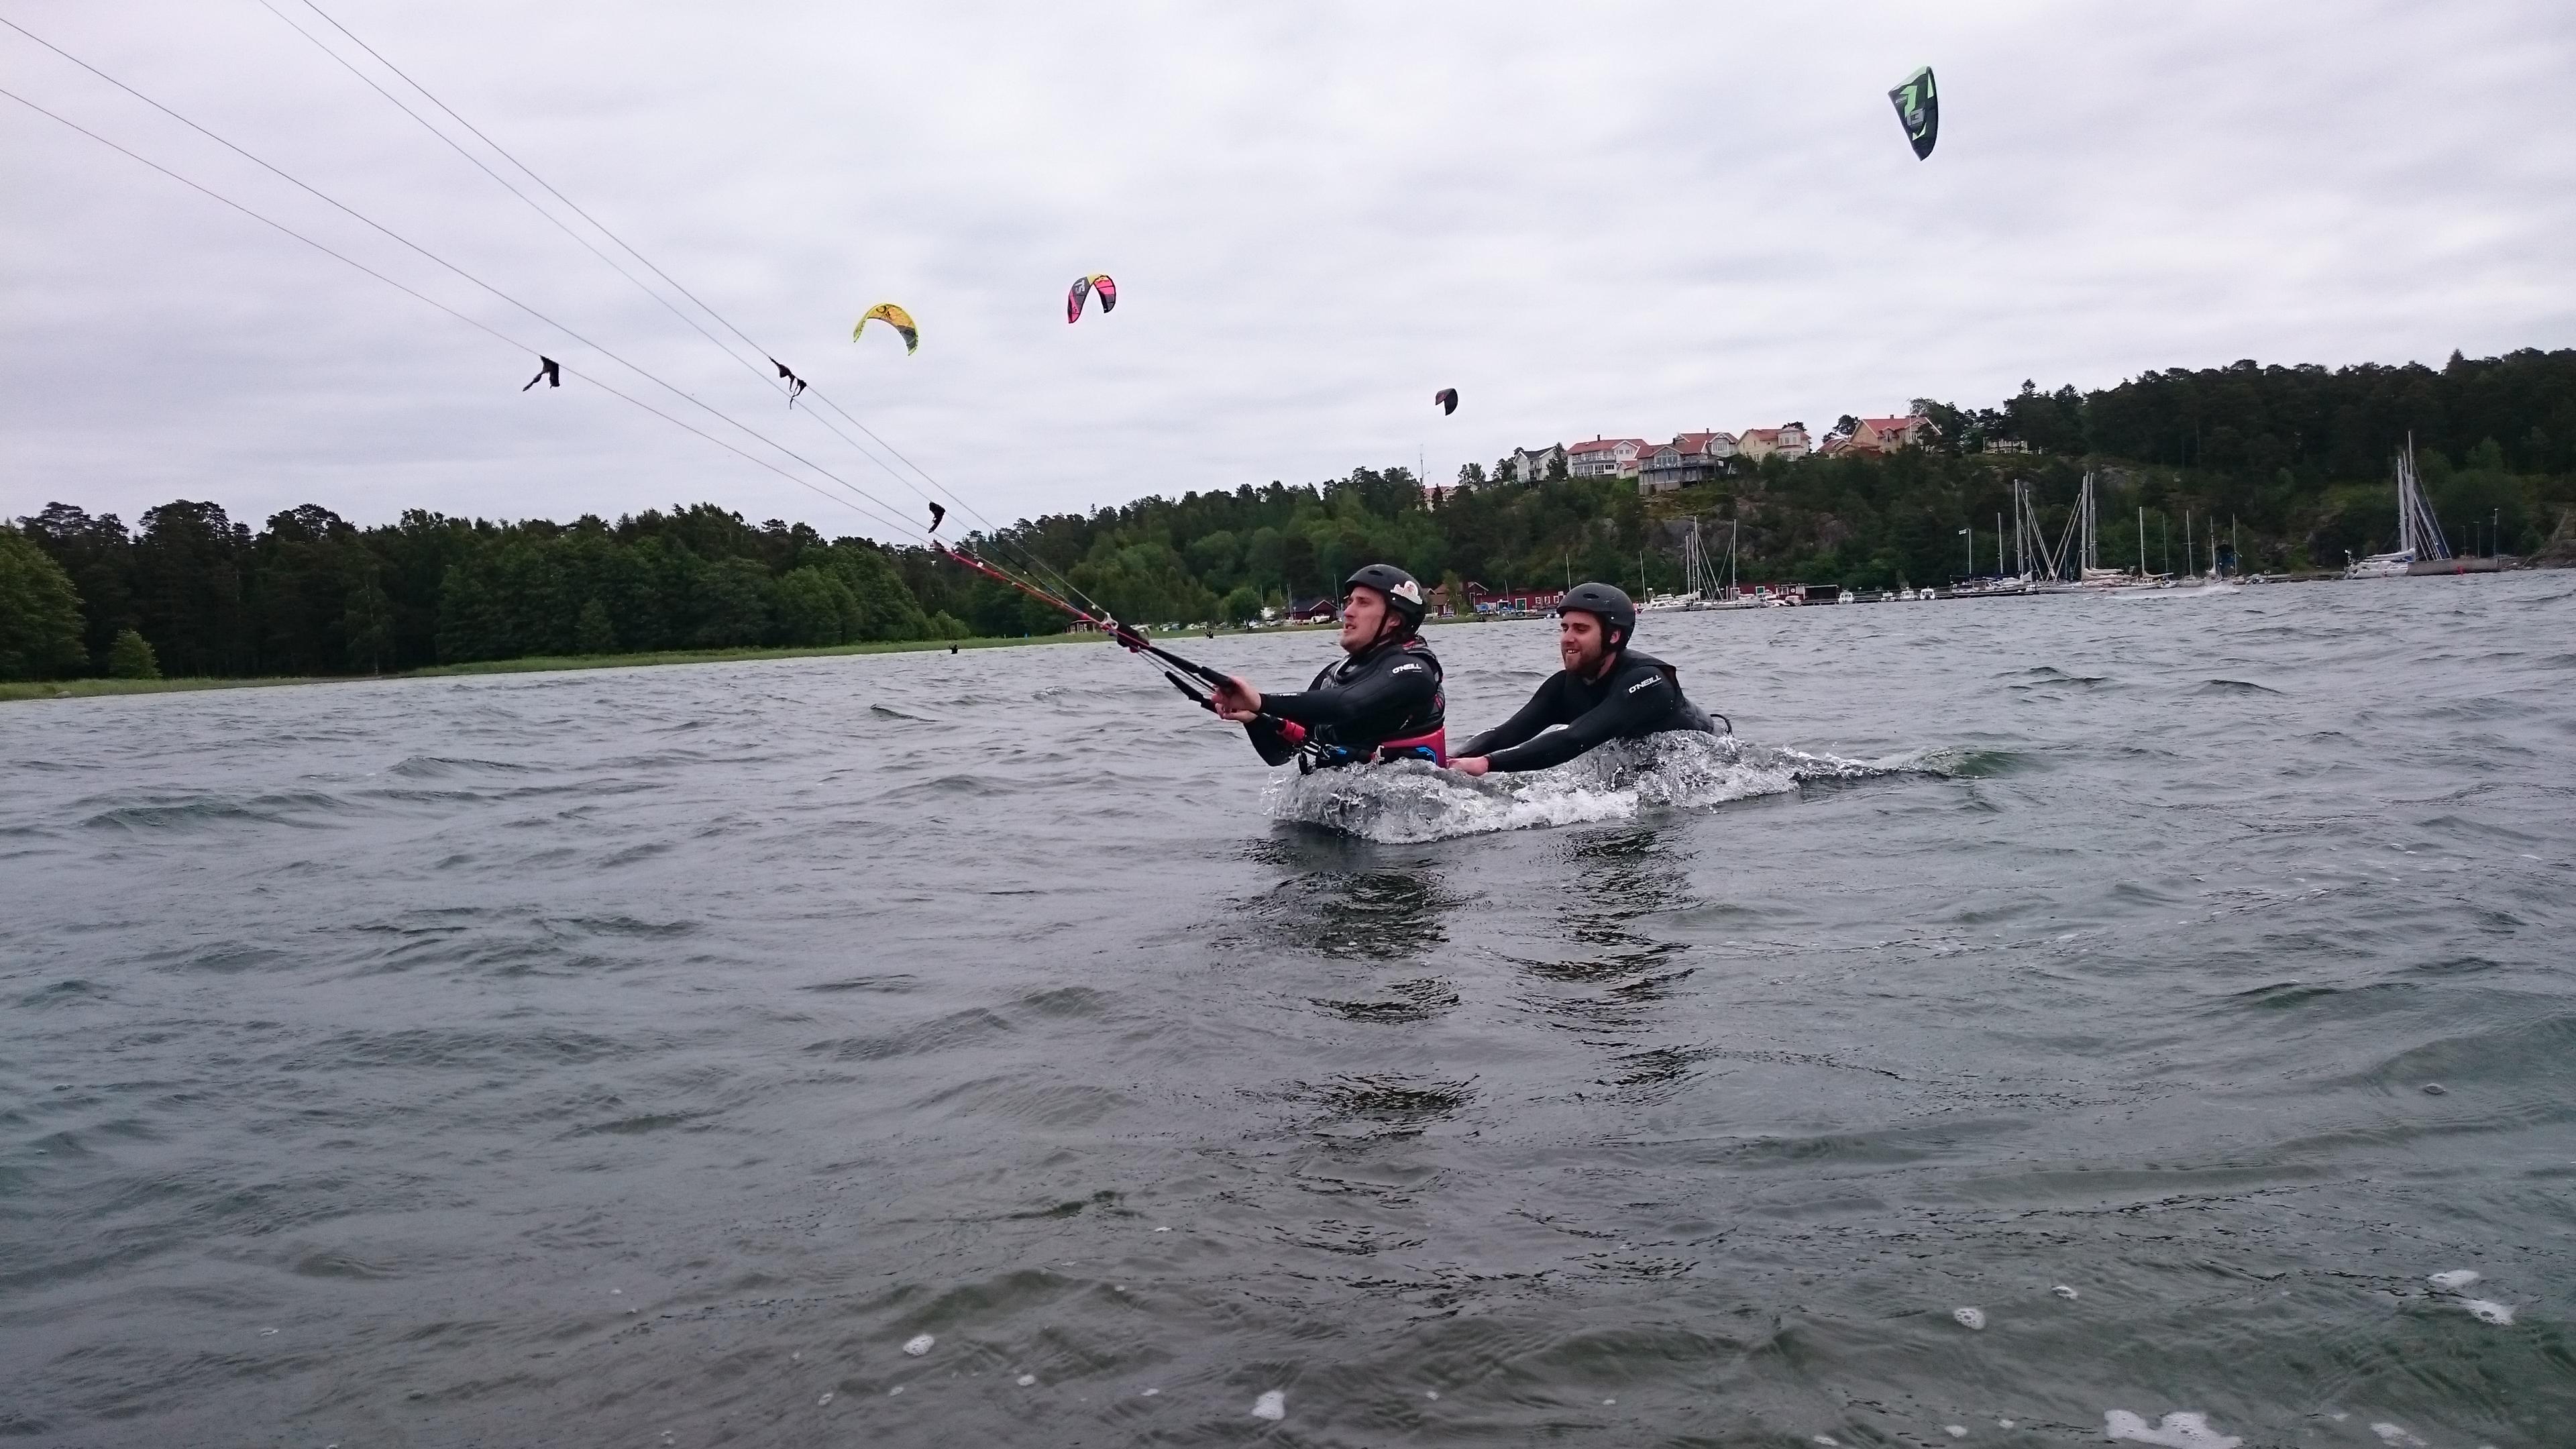 Kitesurfing dalarö